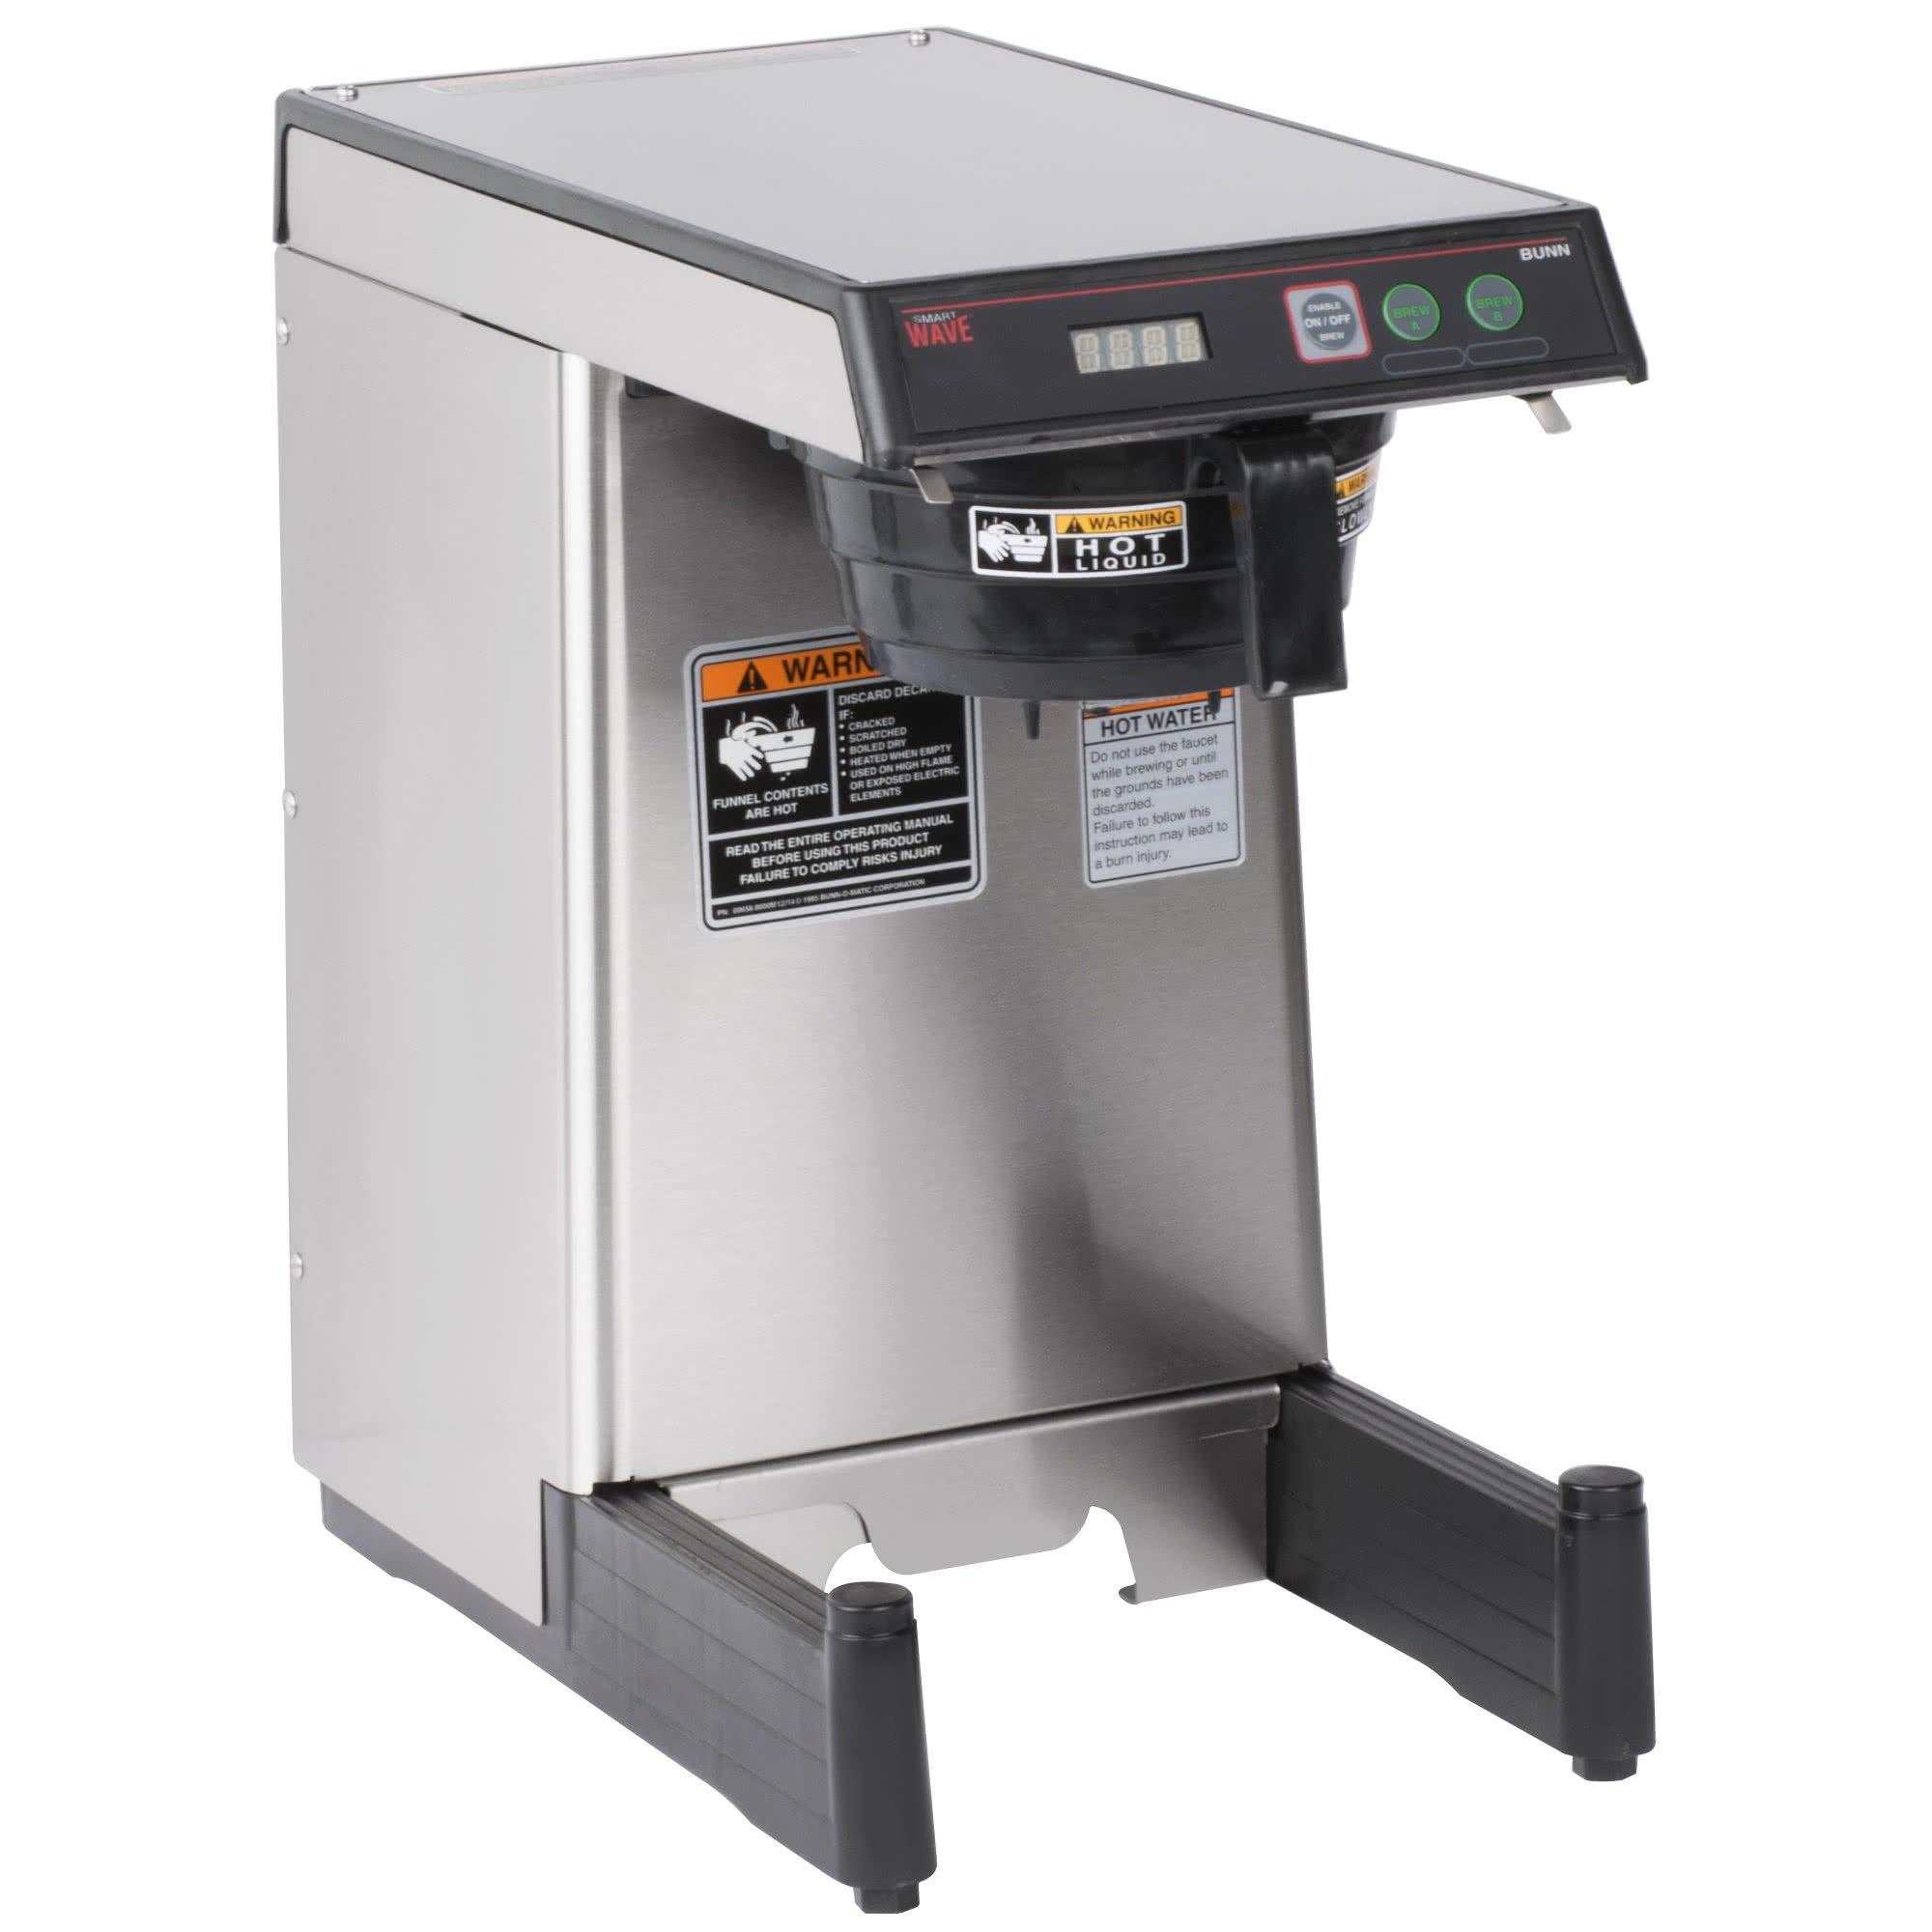 Bunn 39900.0008 WAVE15-APS SmartWave Low Profile